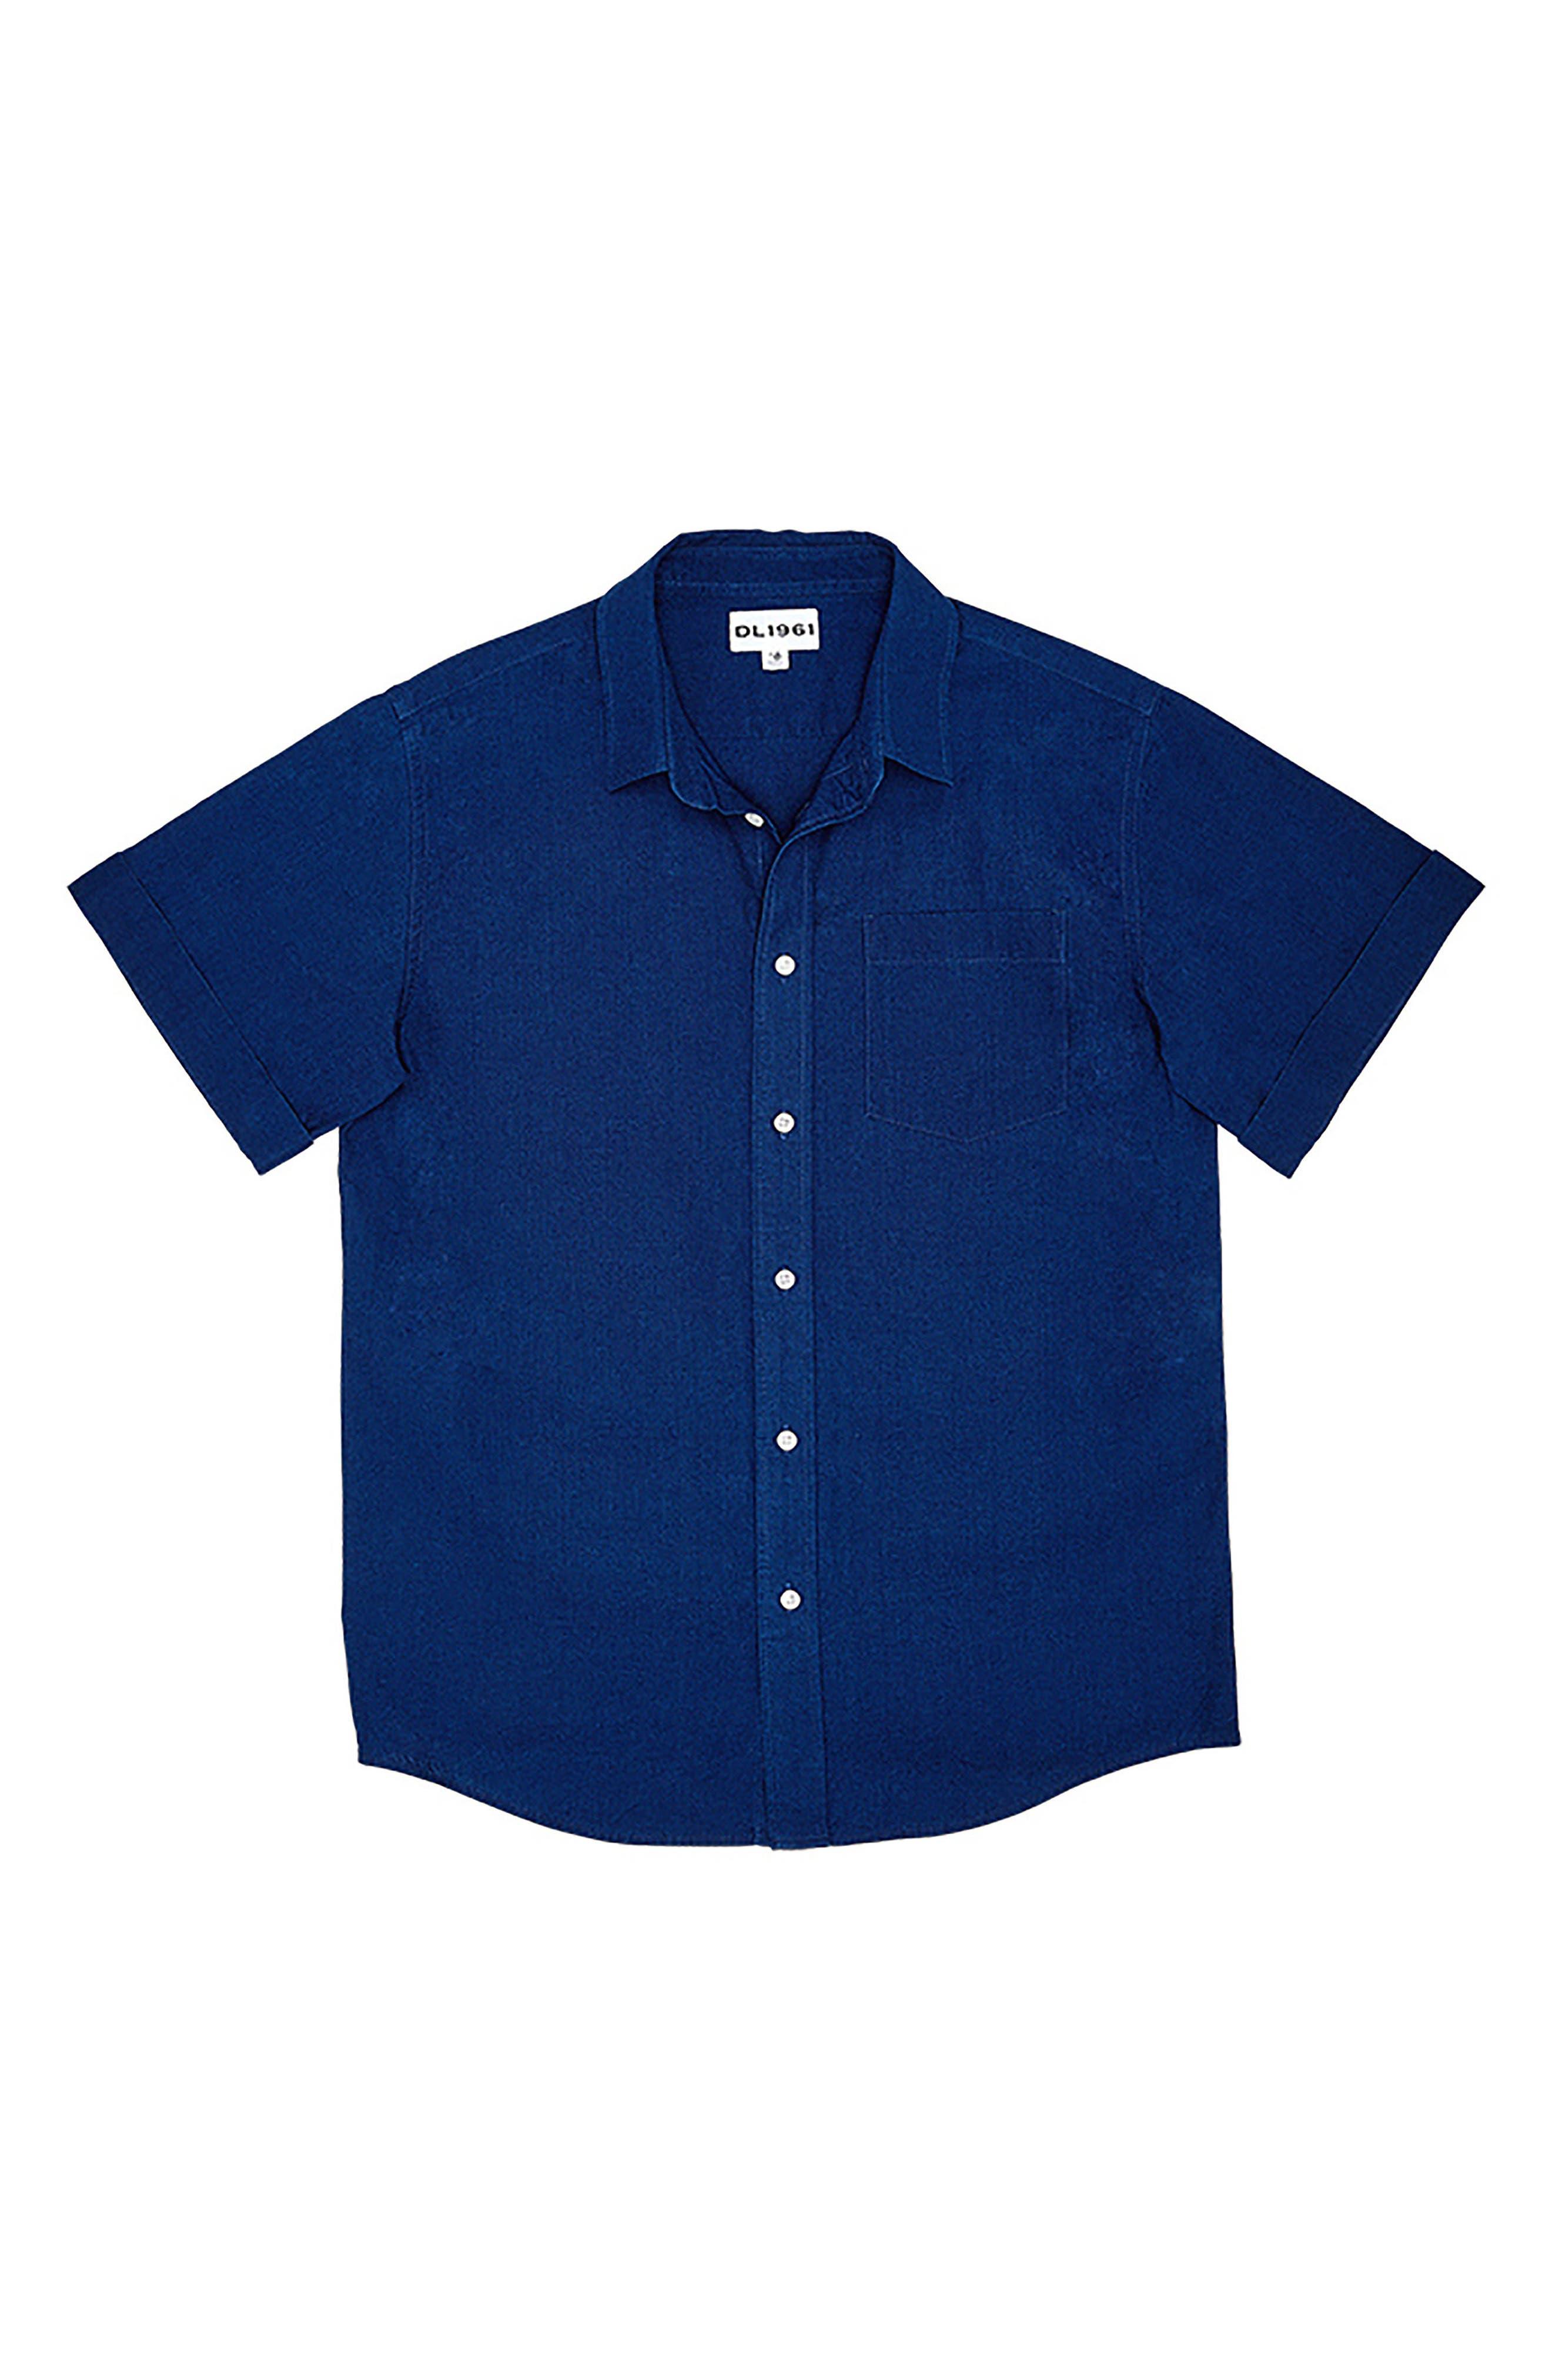 DL 1961 Ash Woven Shirt,                             Main thumbnail 1, color,                             Indigo Plaid